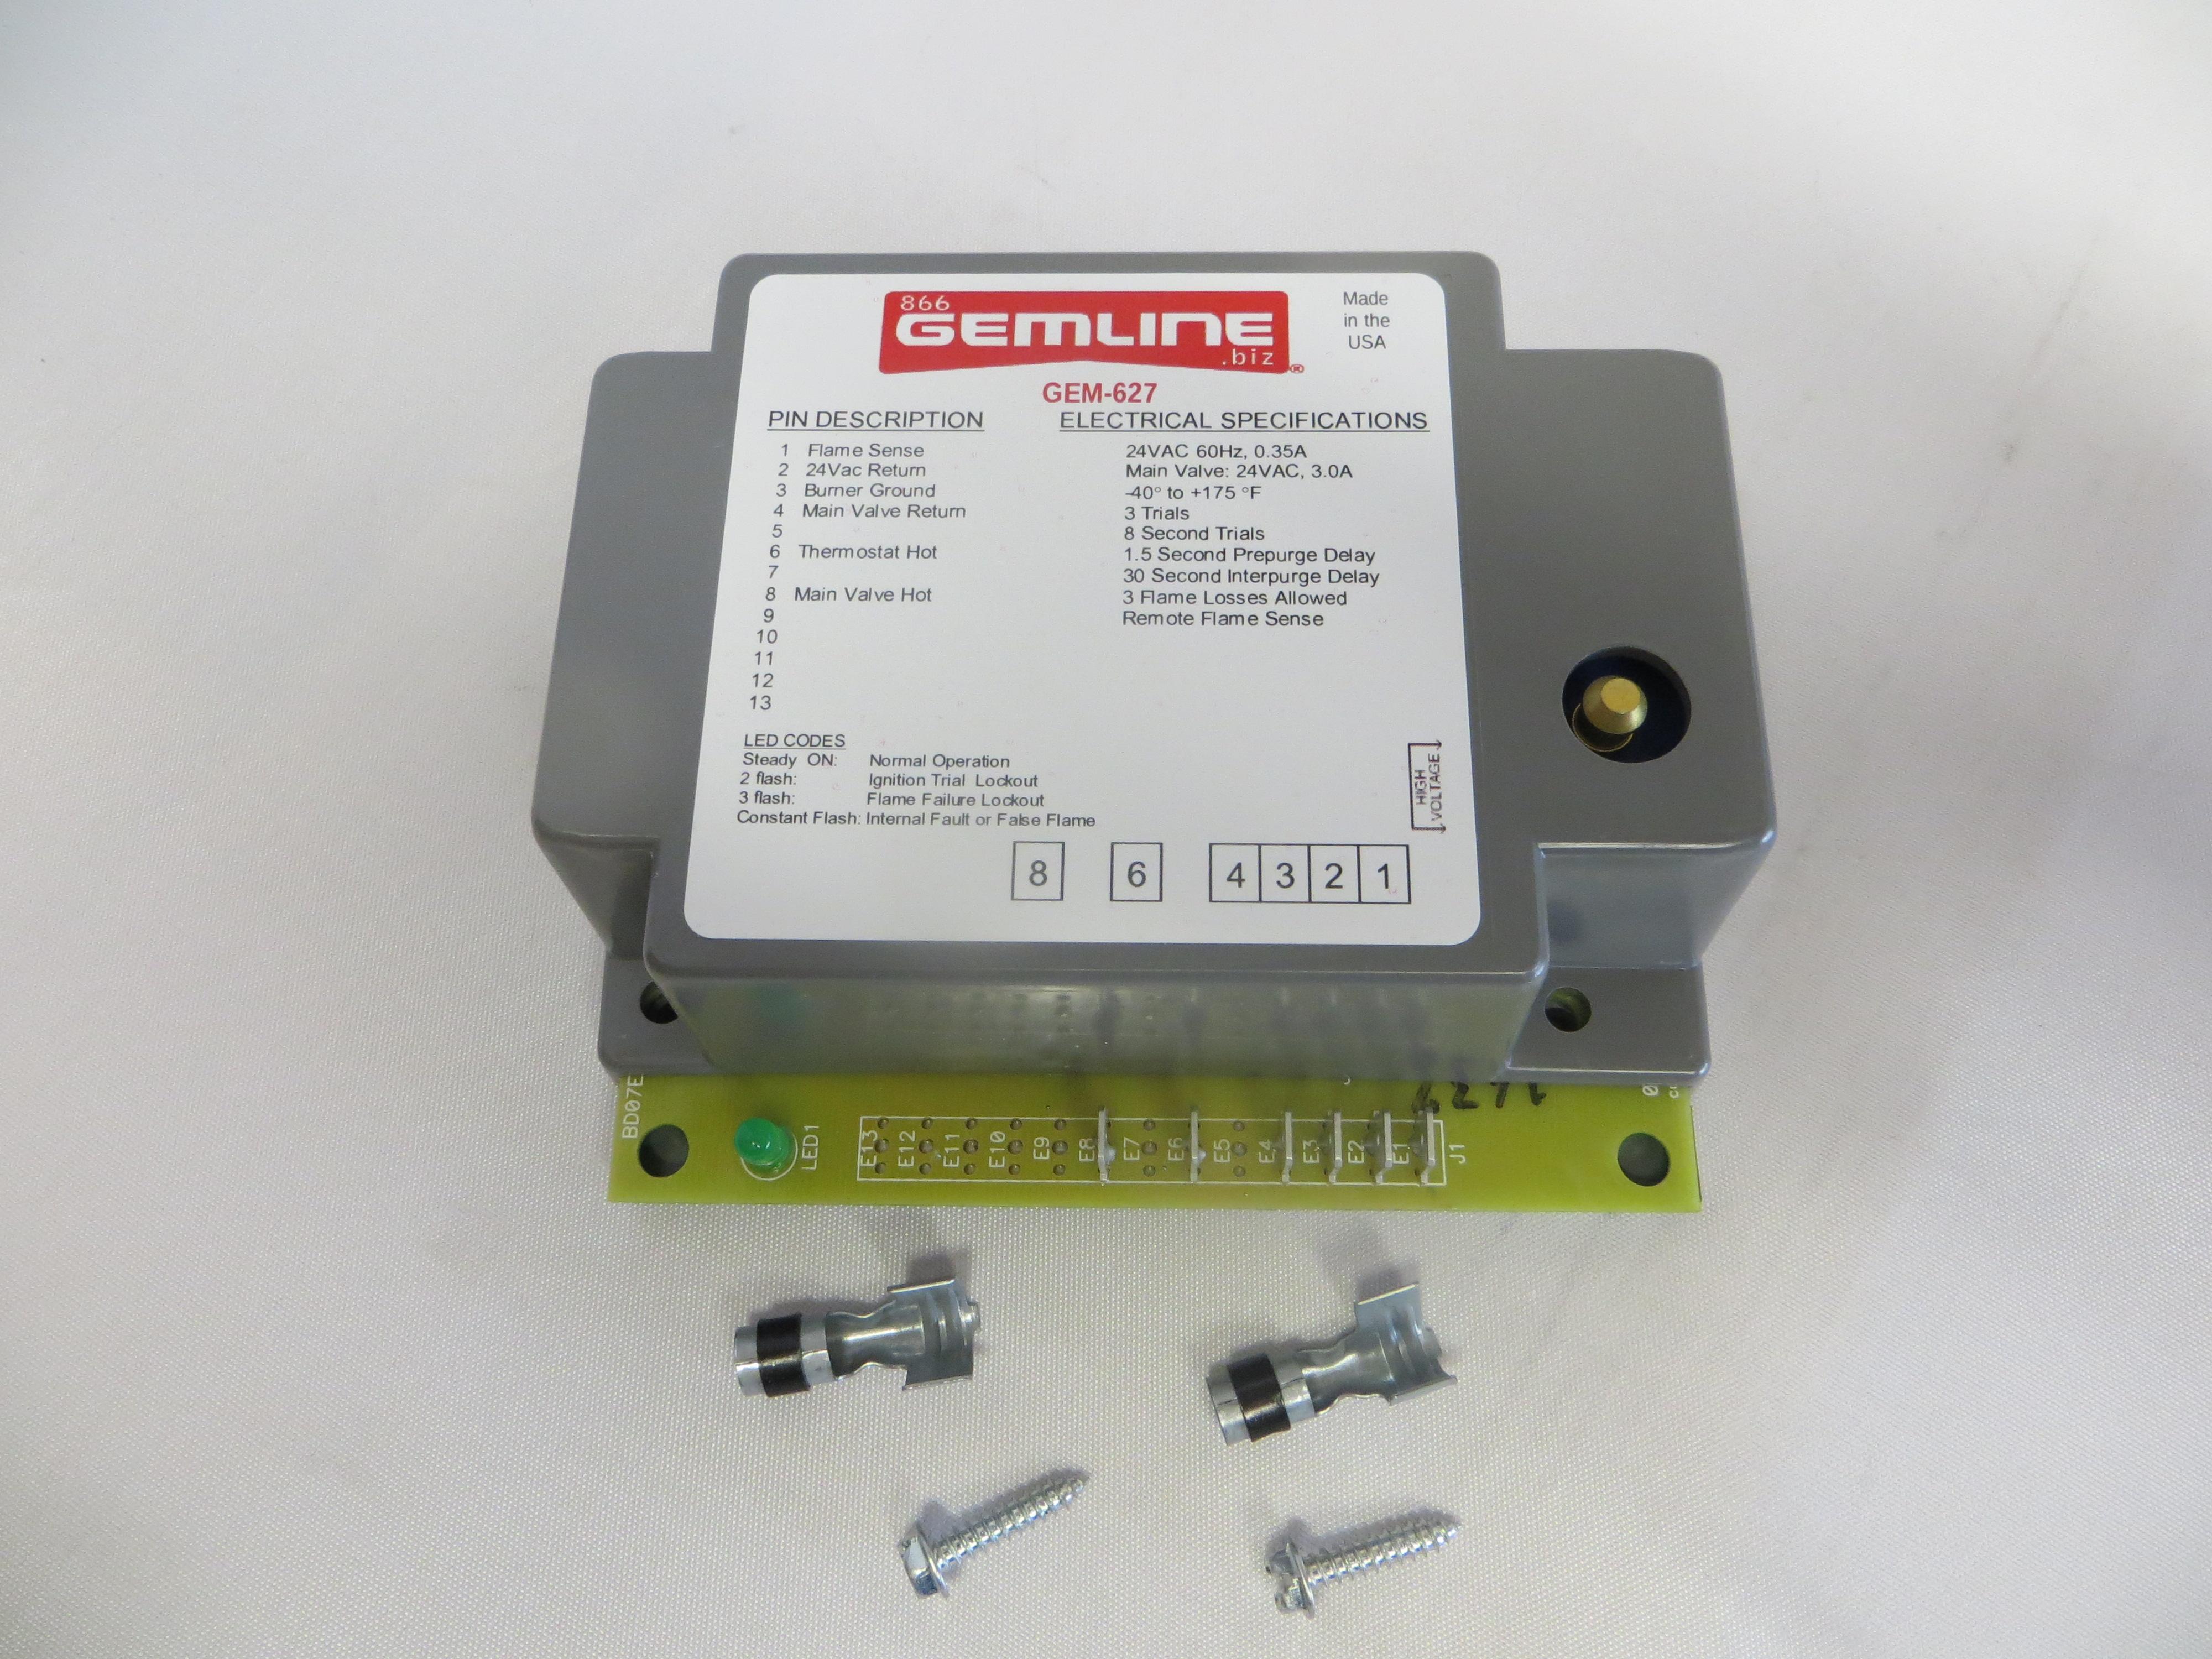 Wfr128979 Adc Gas Valve Wfr128979 Partsking Com